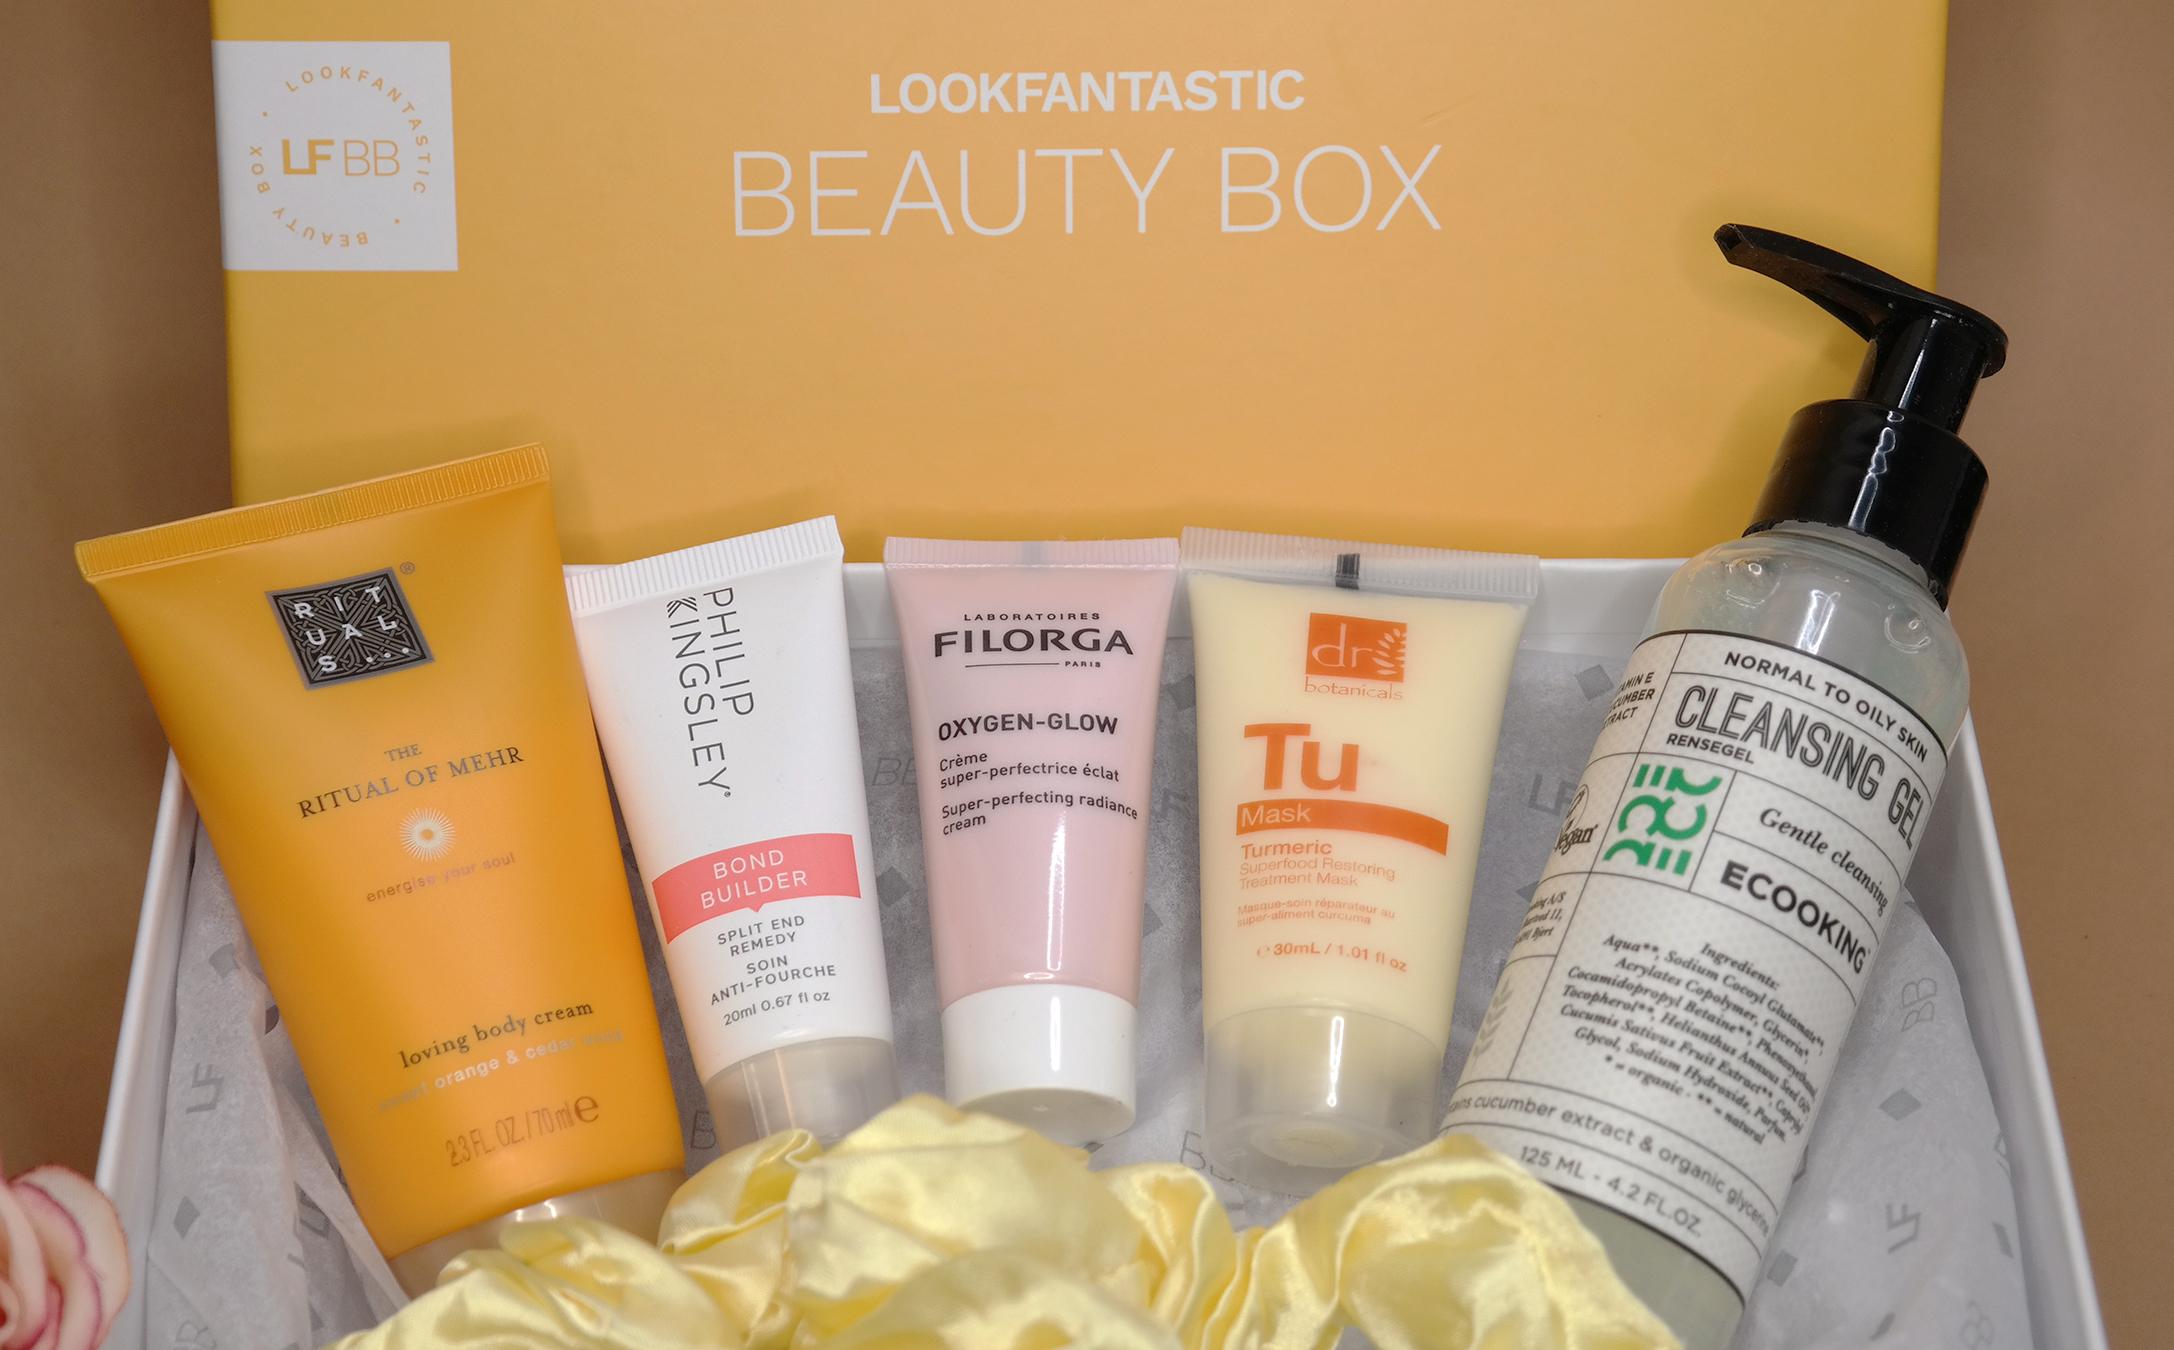 Lookfantastic Beauty box lokakuu kauneusboksi